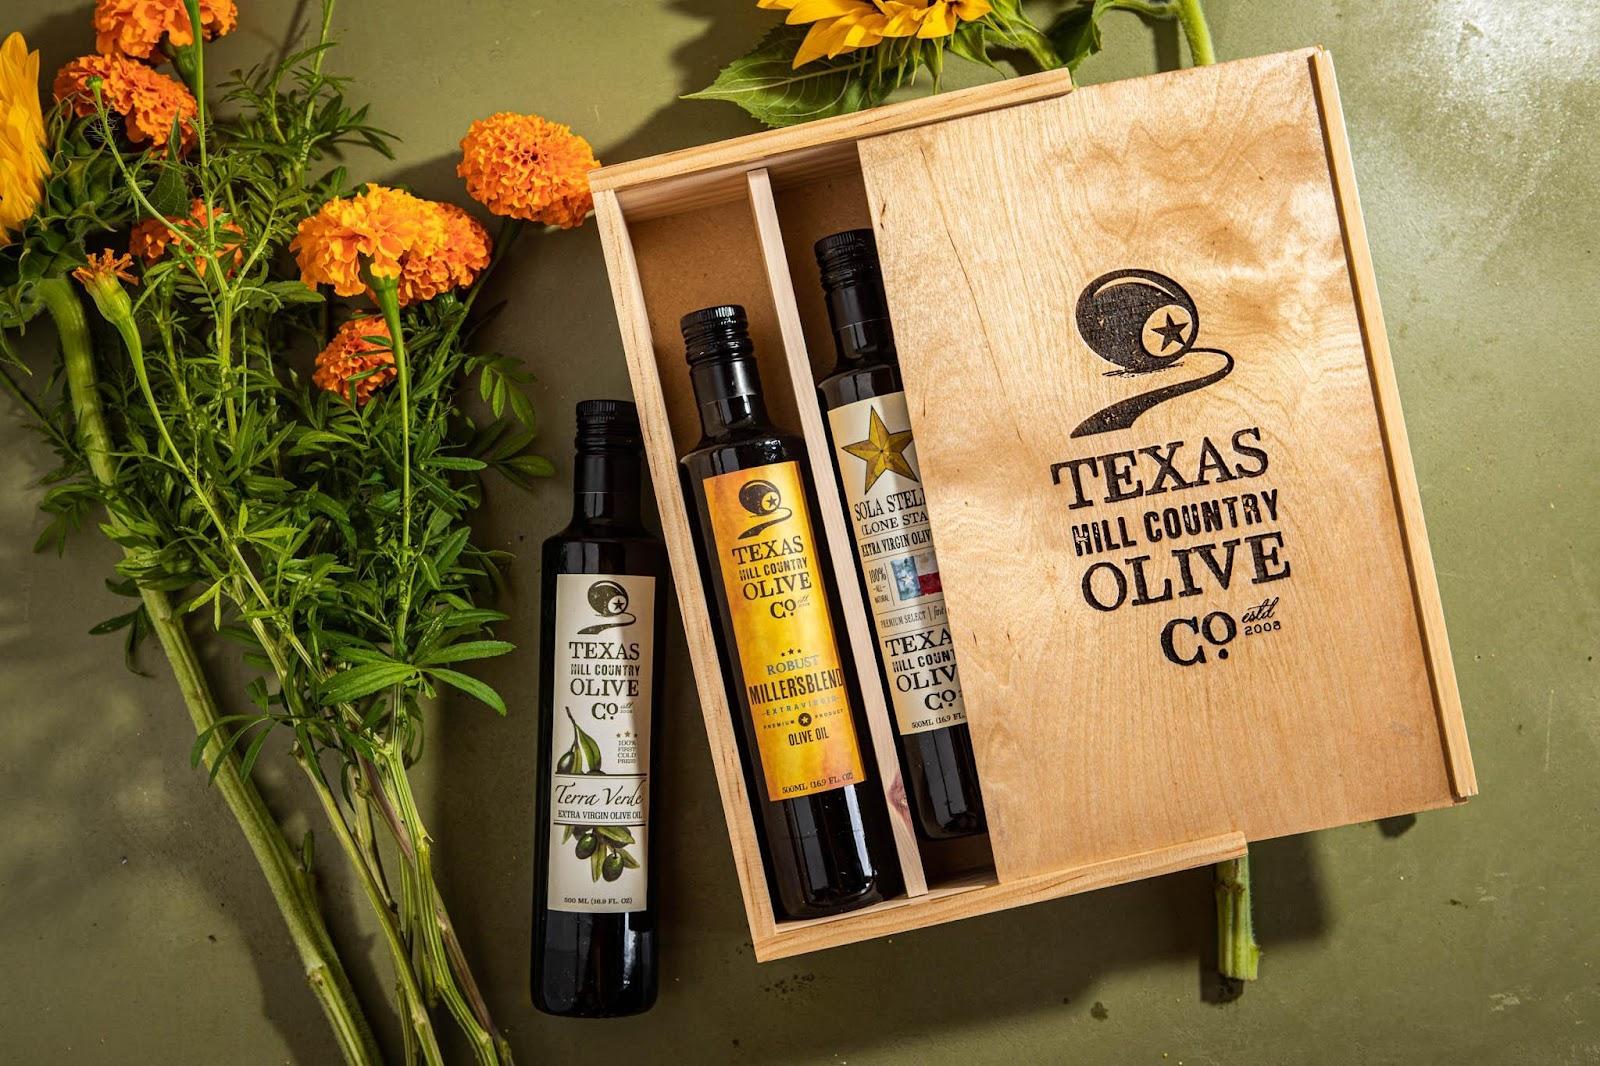 Texas olive oil flight